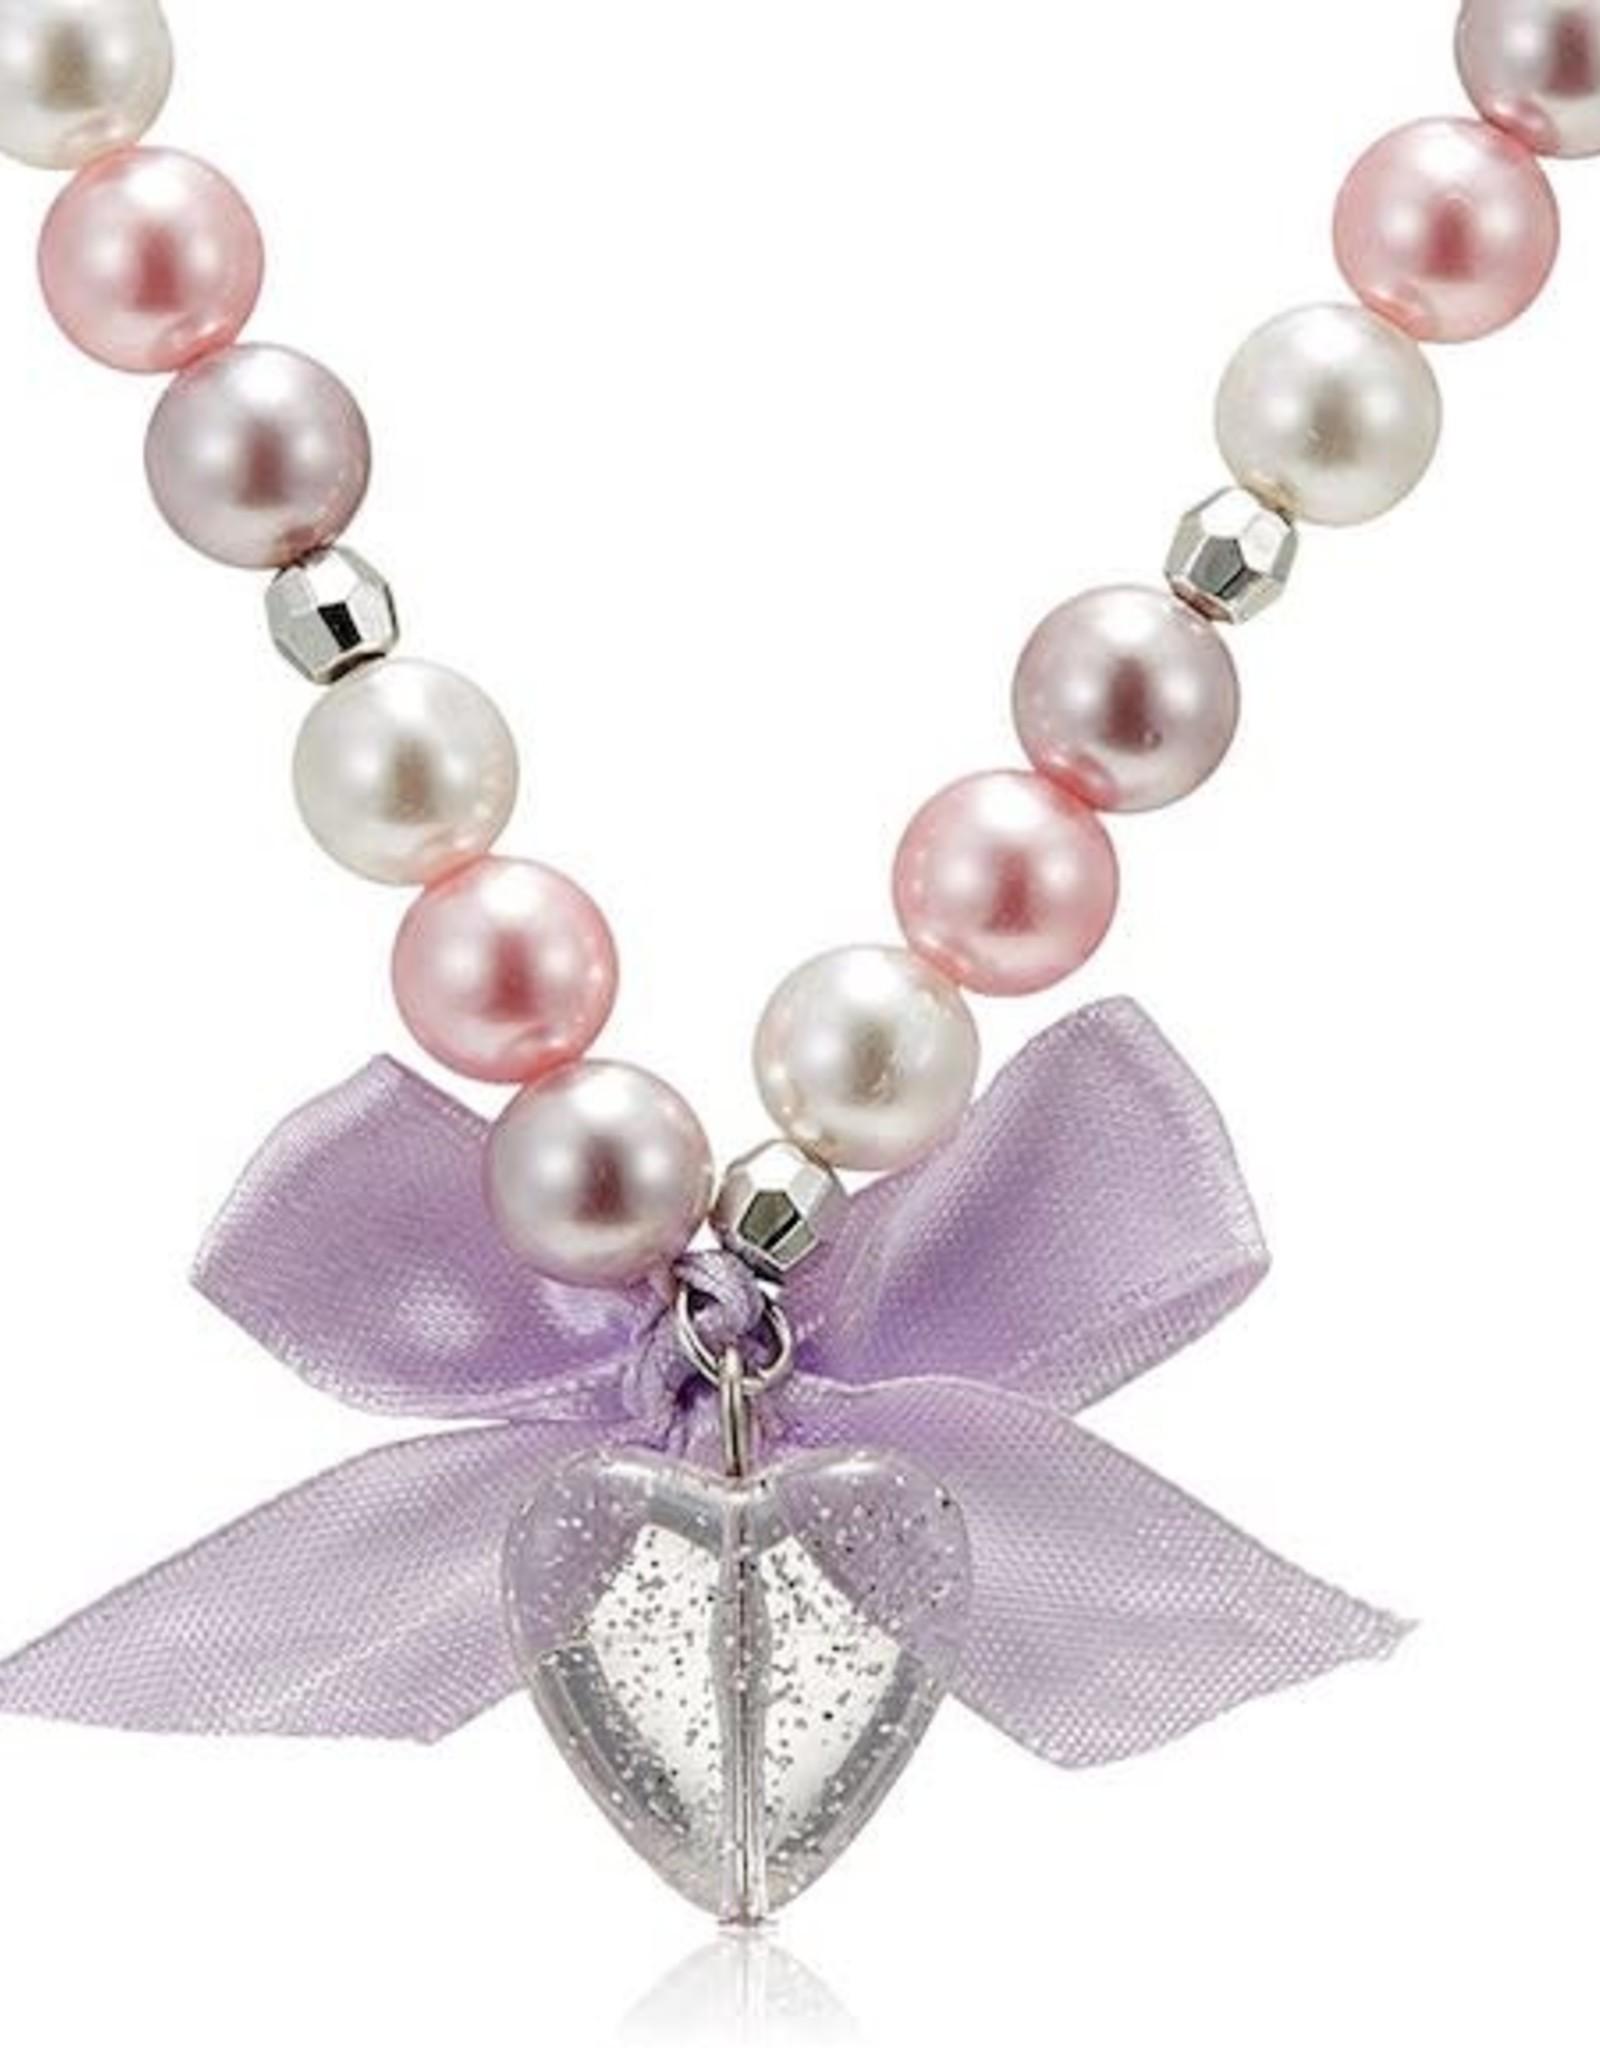 Sparkle princess necklace